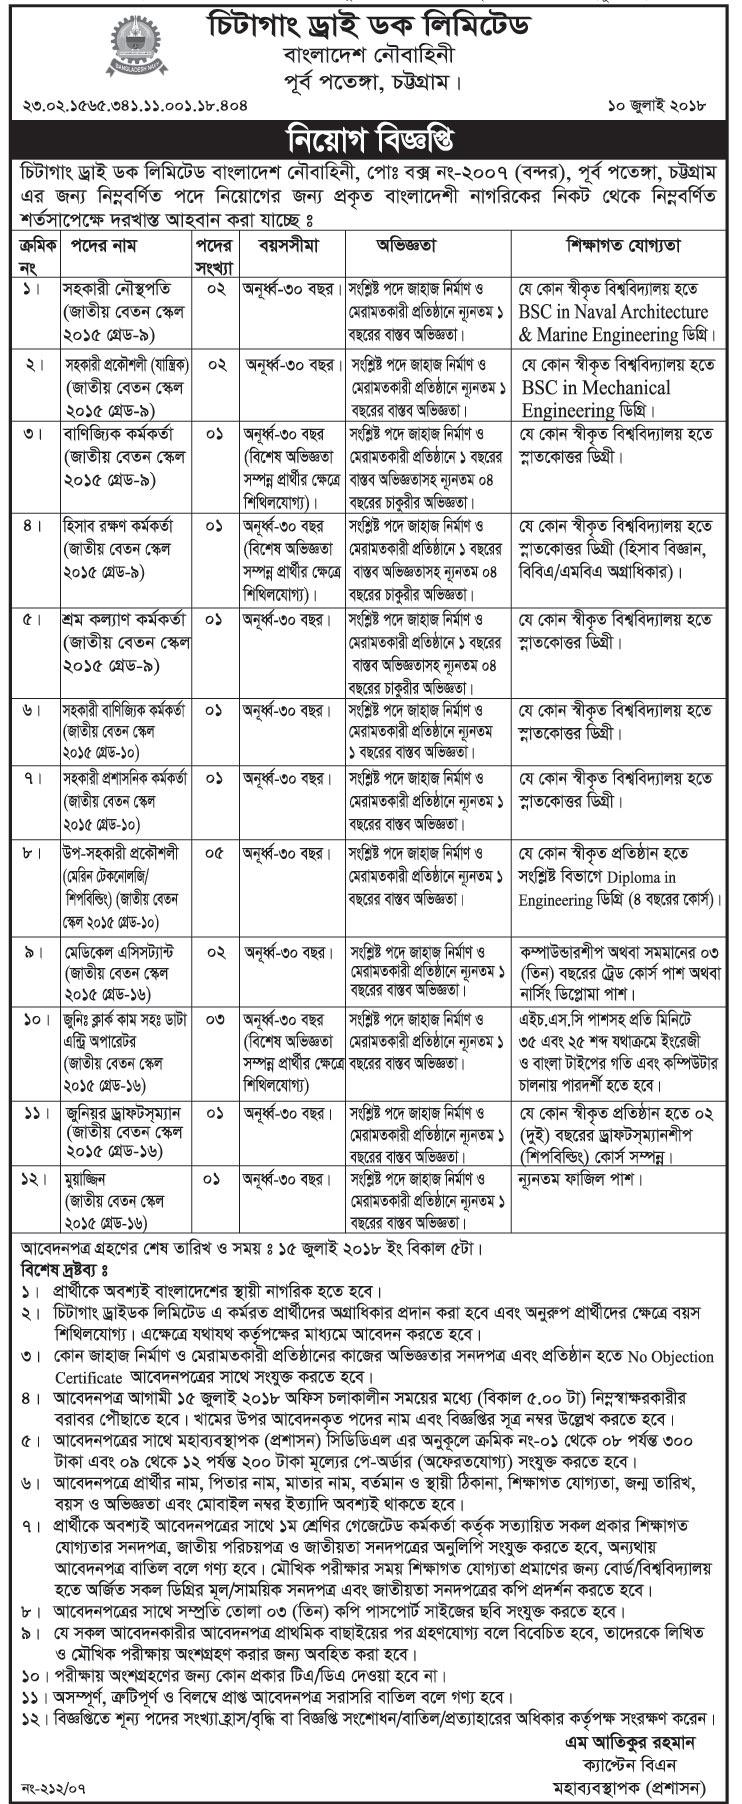 Chittagong Dry Dock Limited Jobs Circular 2018